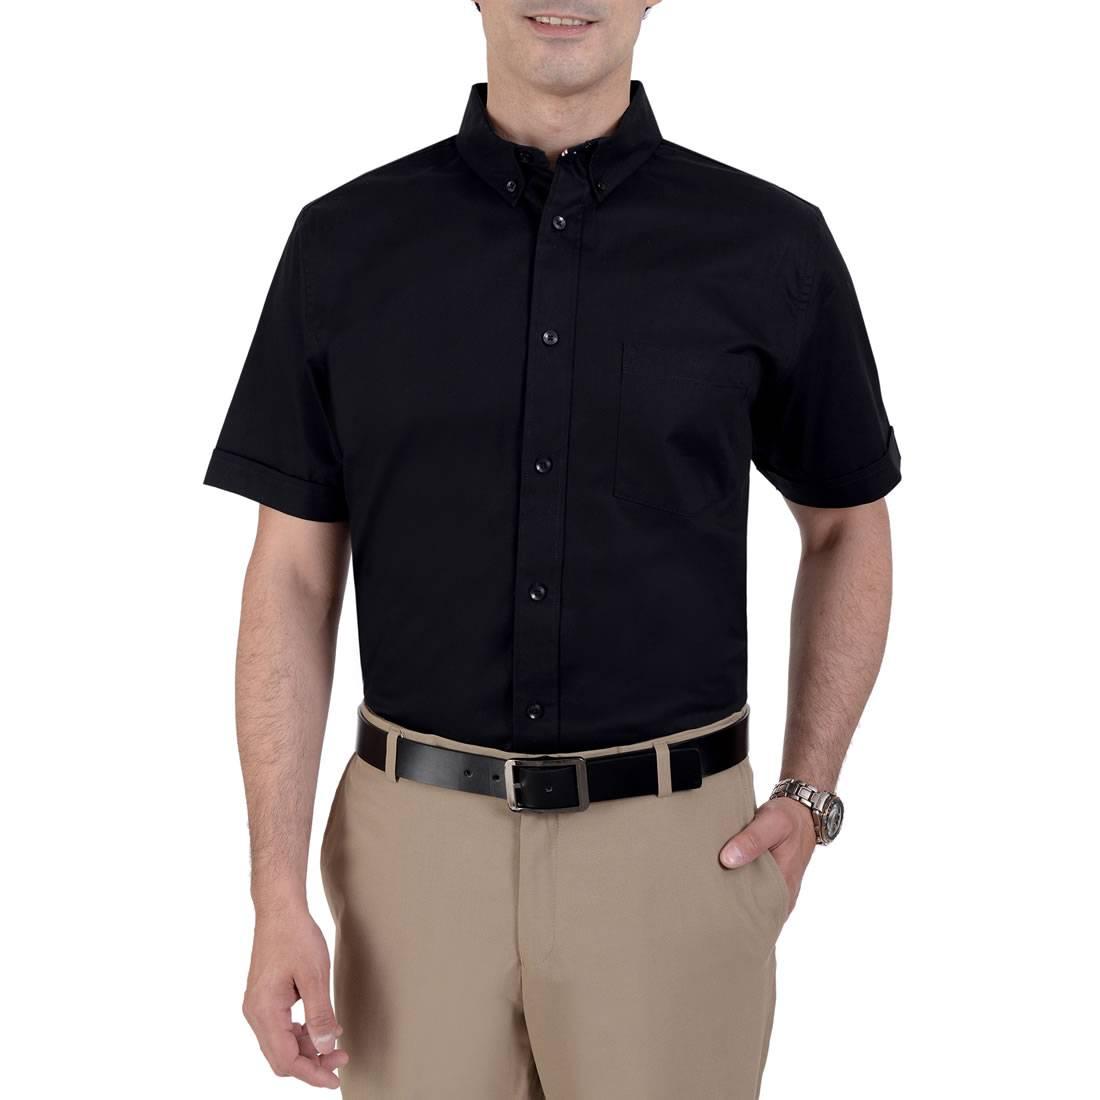 042331381709-01-Camisa-Manga-Corta-classic-Fit-Negro-yale